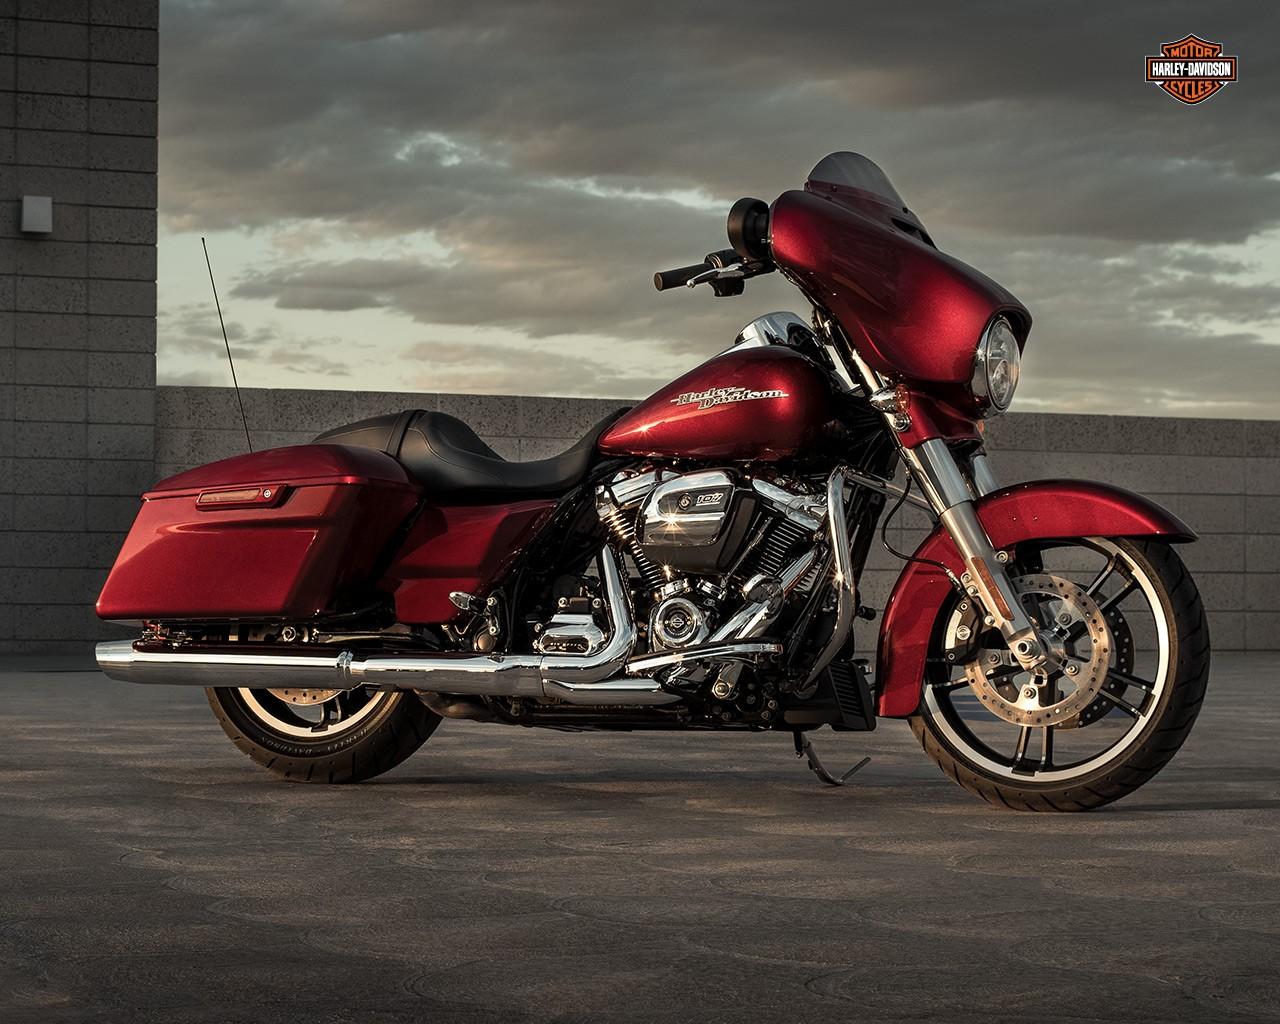 Harley Electra Glide Wallpaper